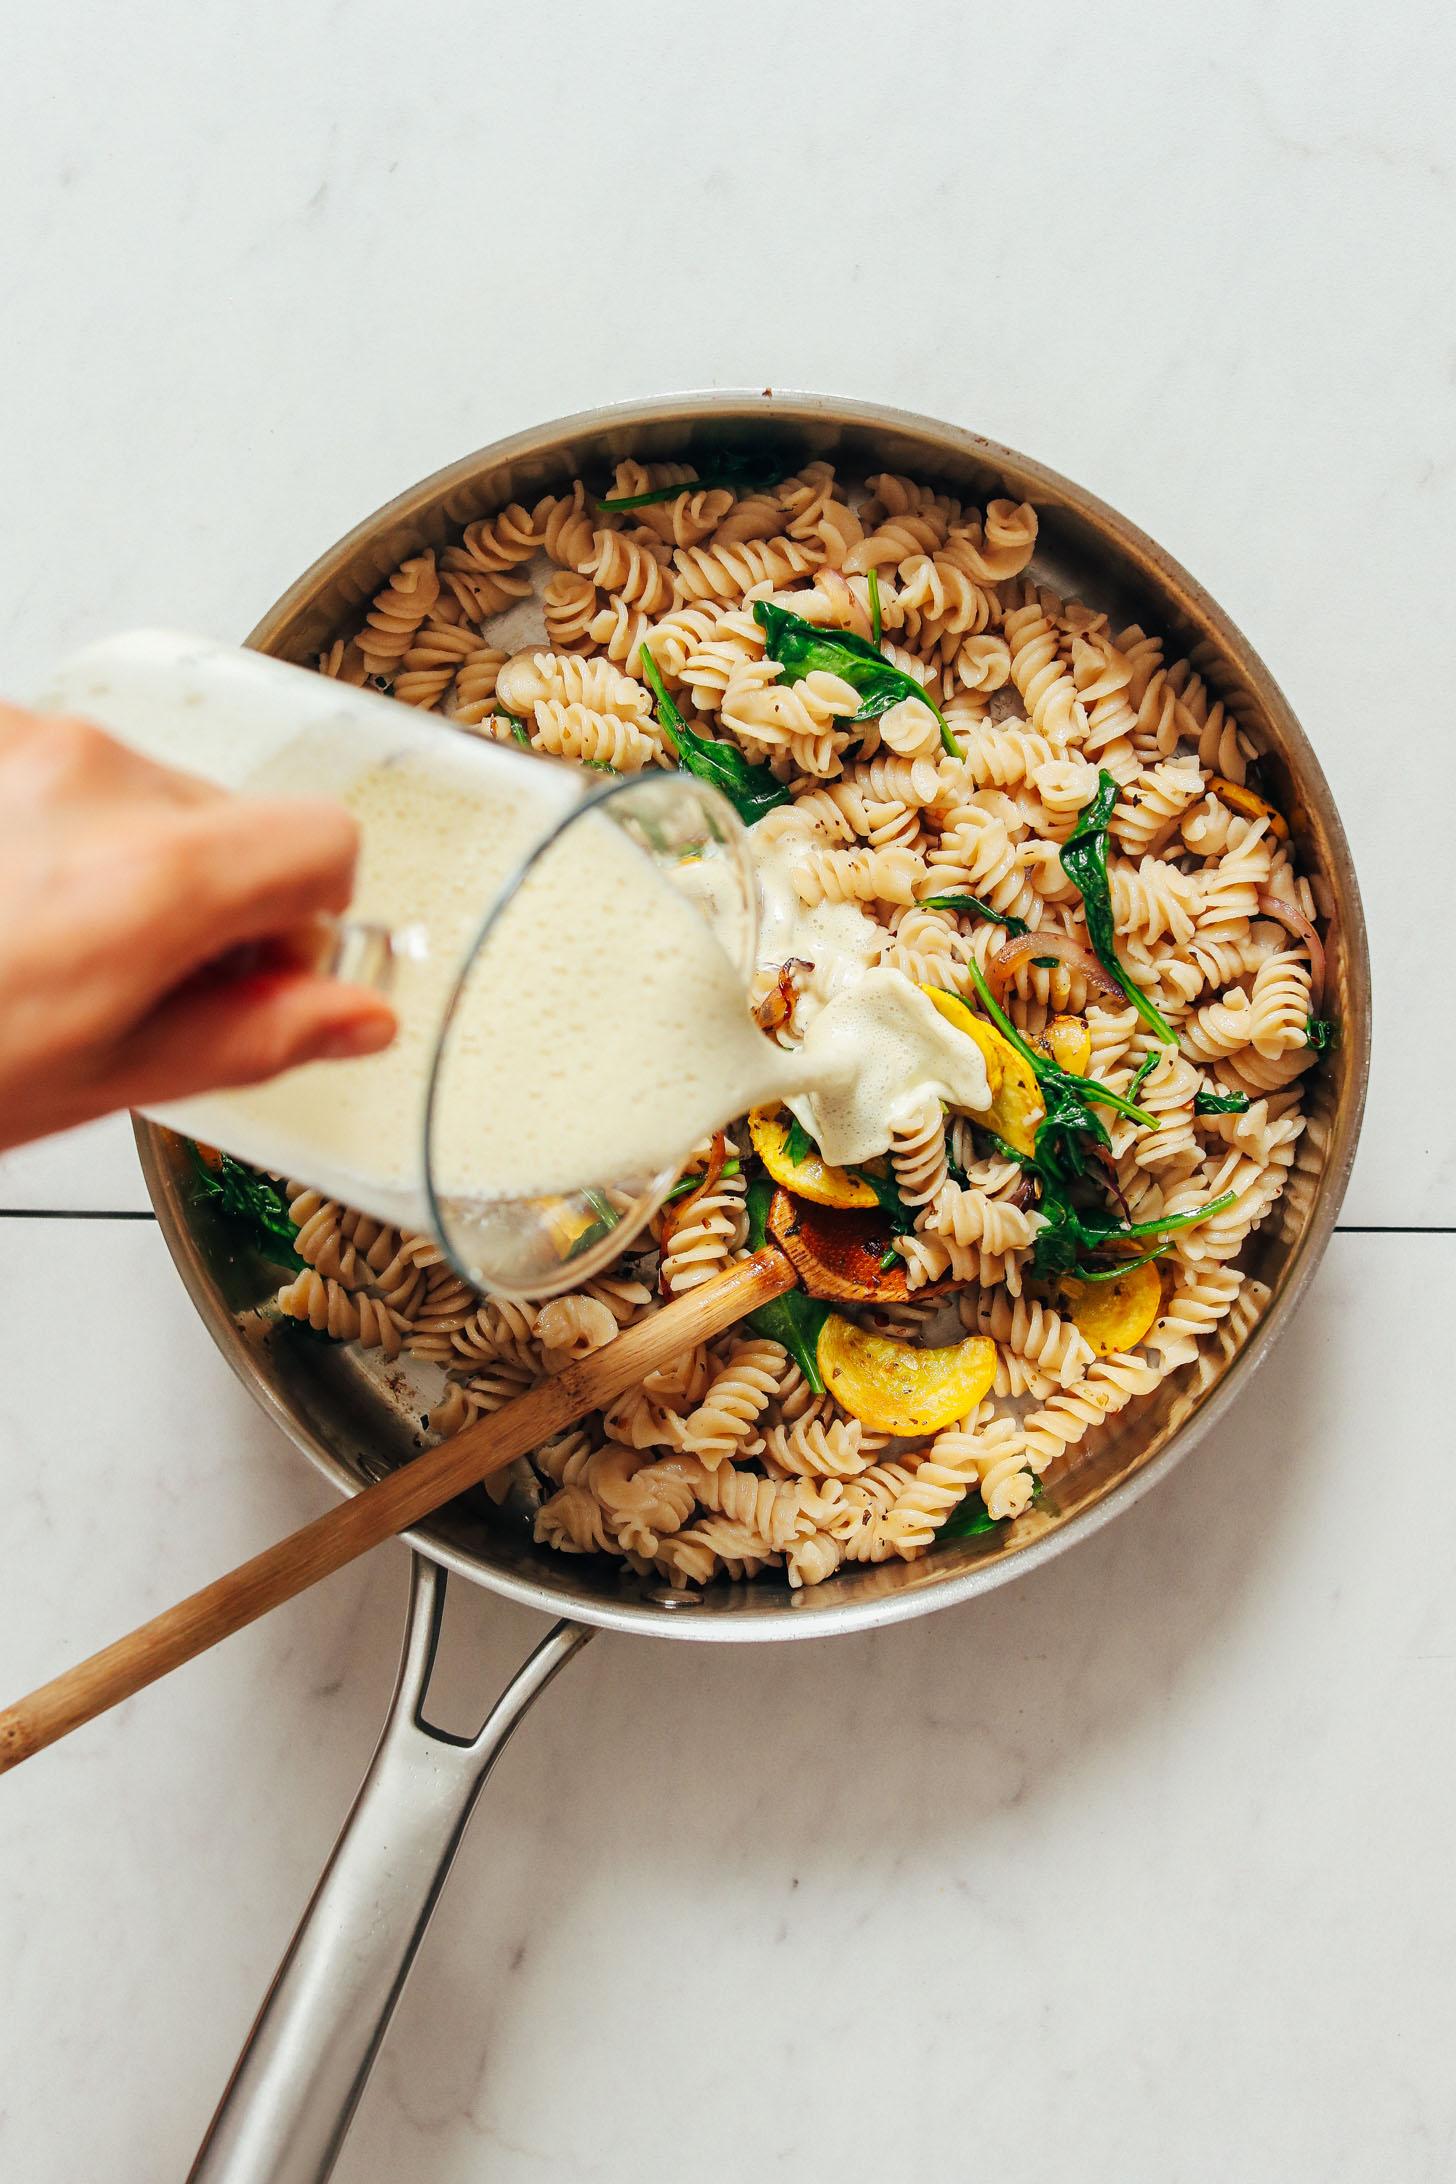 Pouring creamy cashew alfredo onto pasta and sautéed veggies